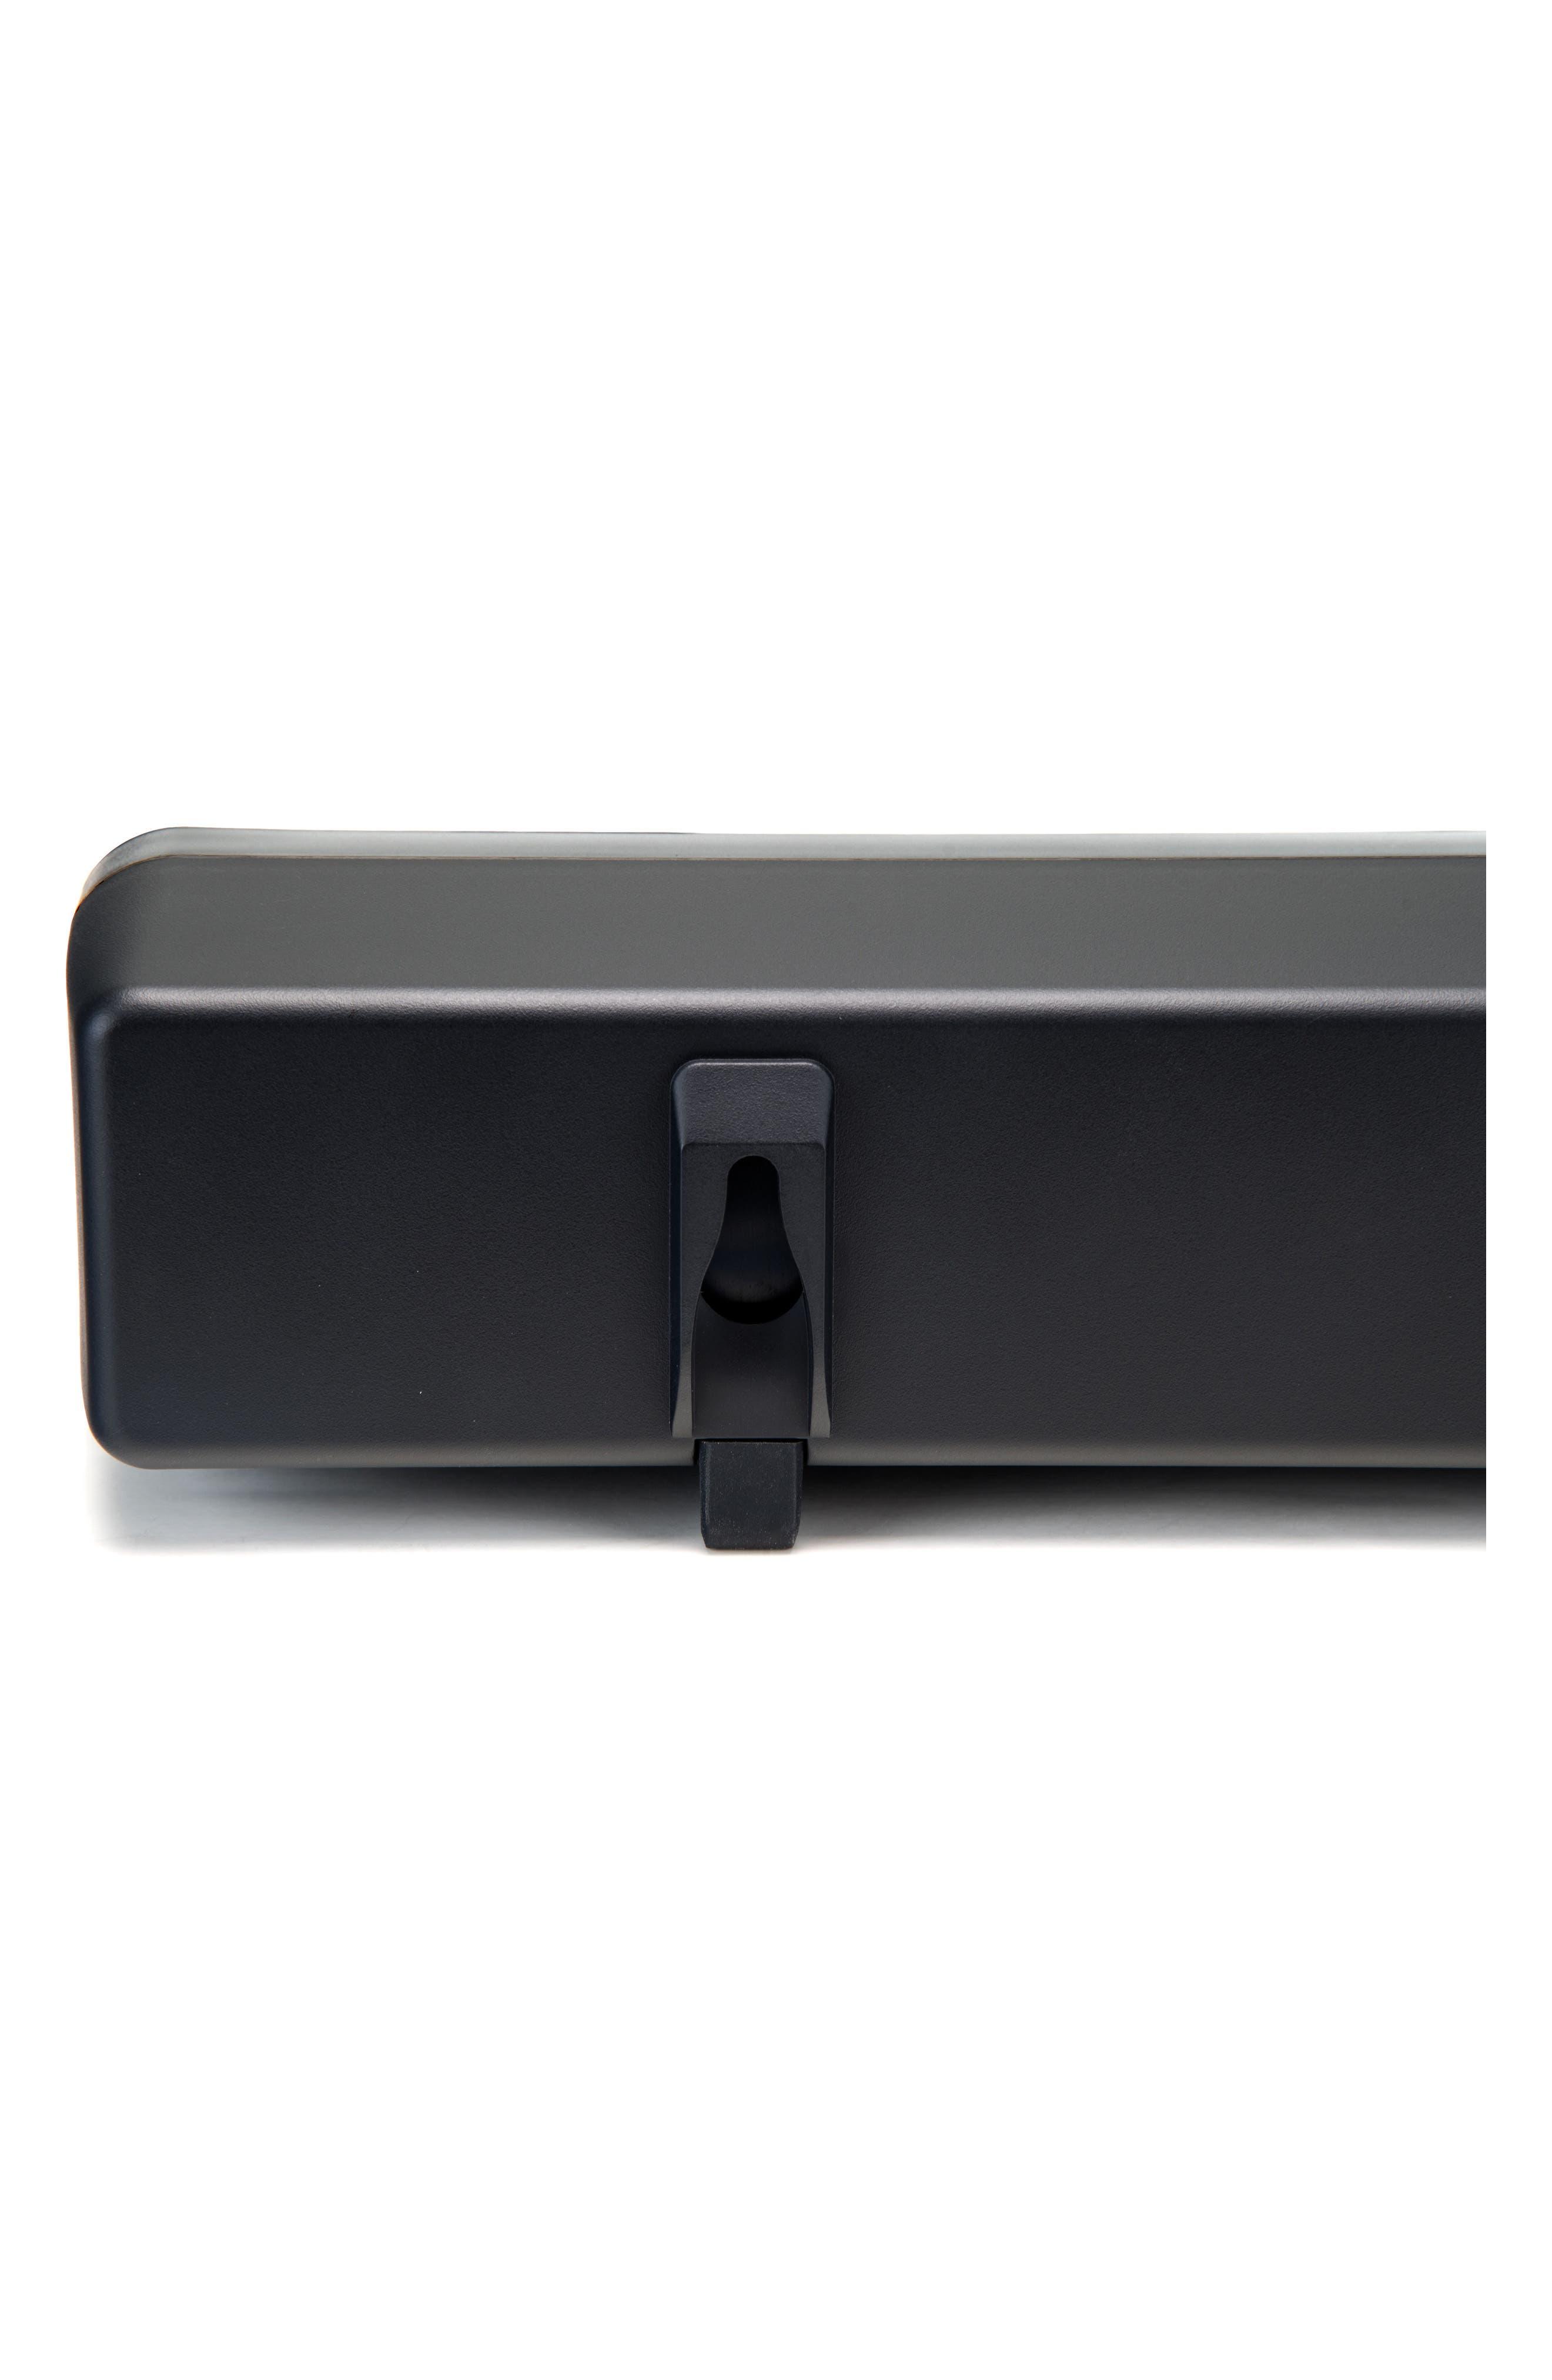 RSB-6 Soundbar & Subwoofer,                             Alternate thumbnail 8, color,                             Black